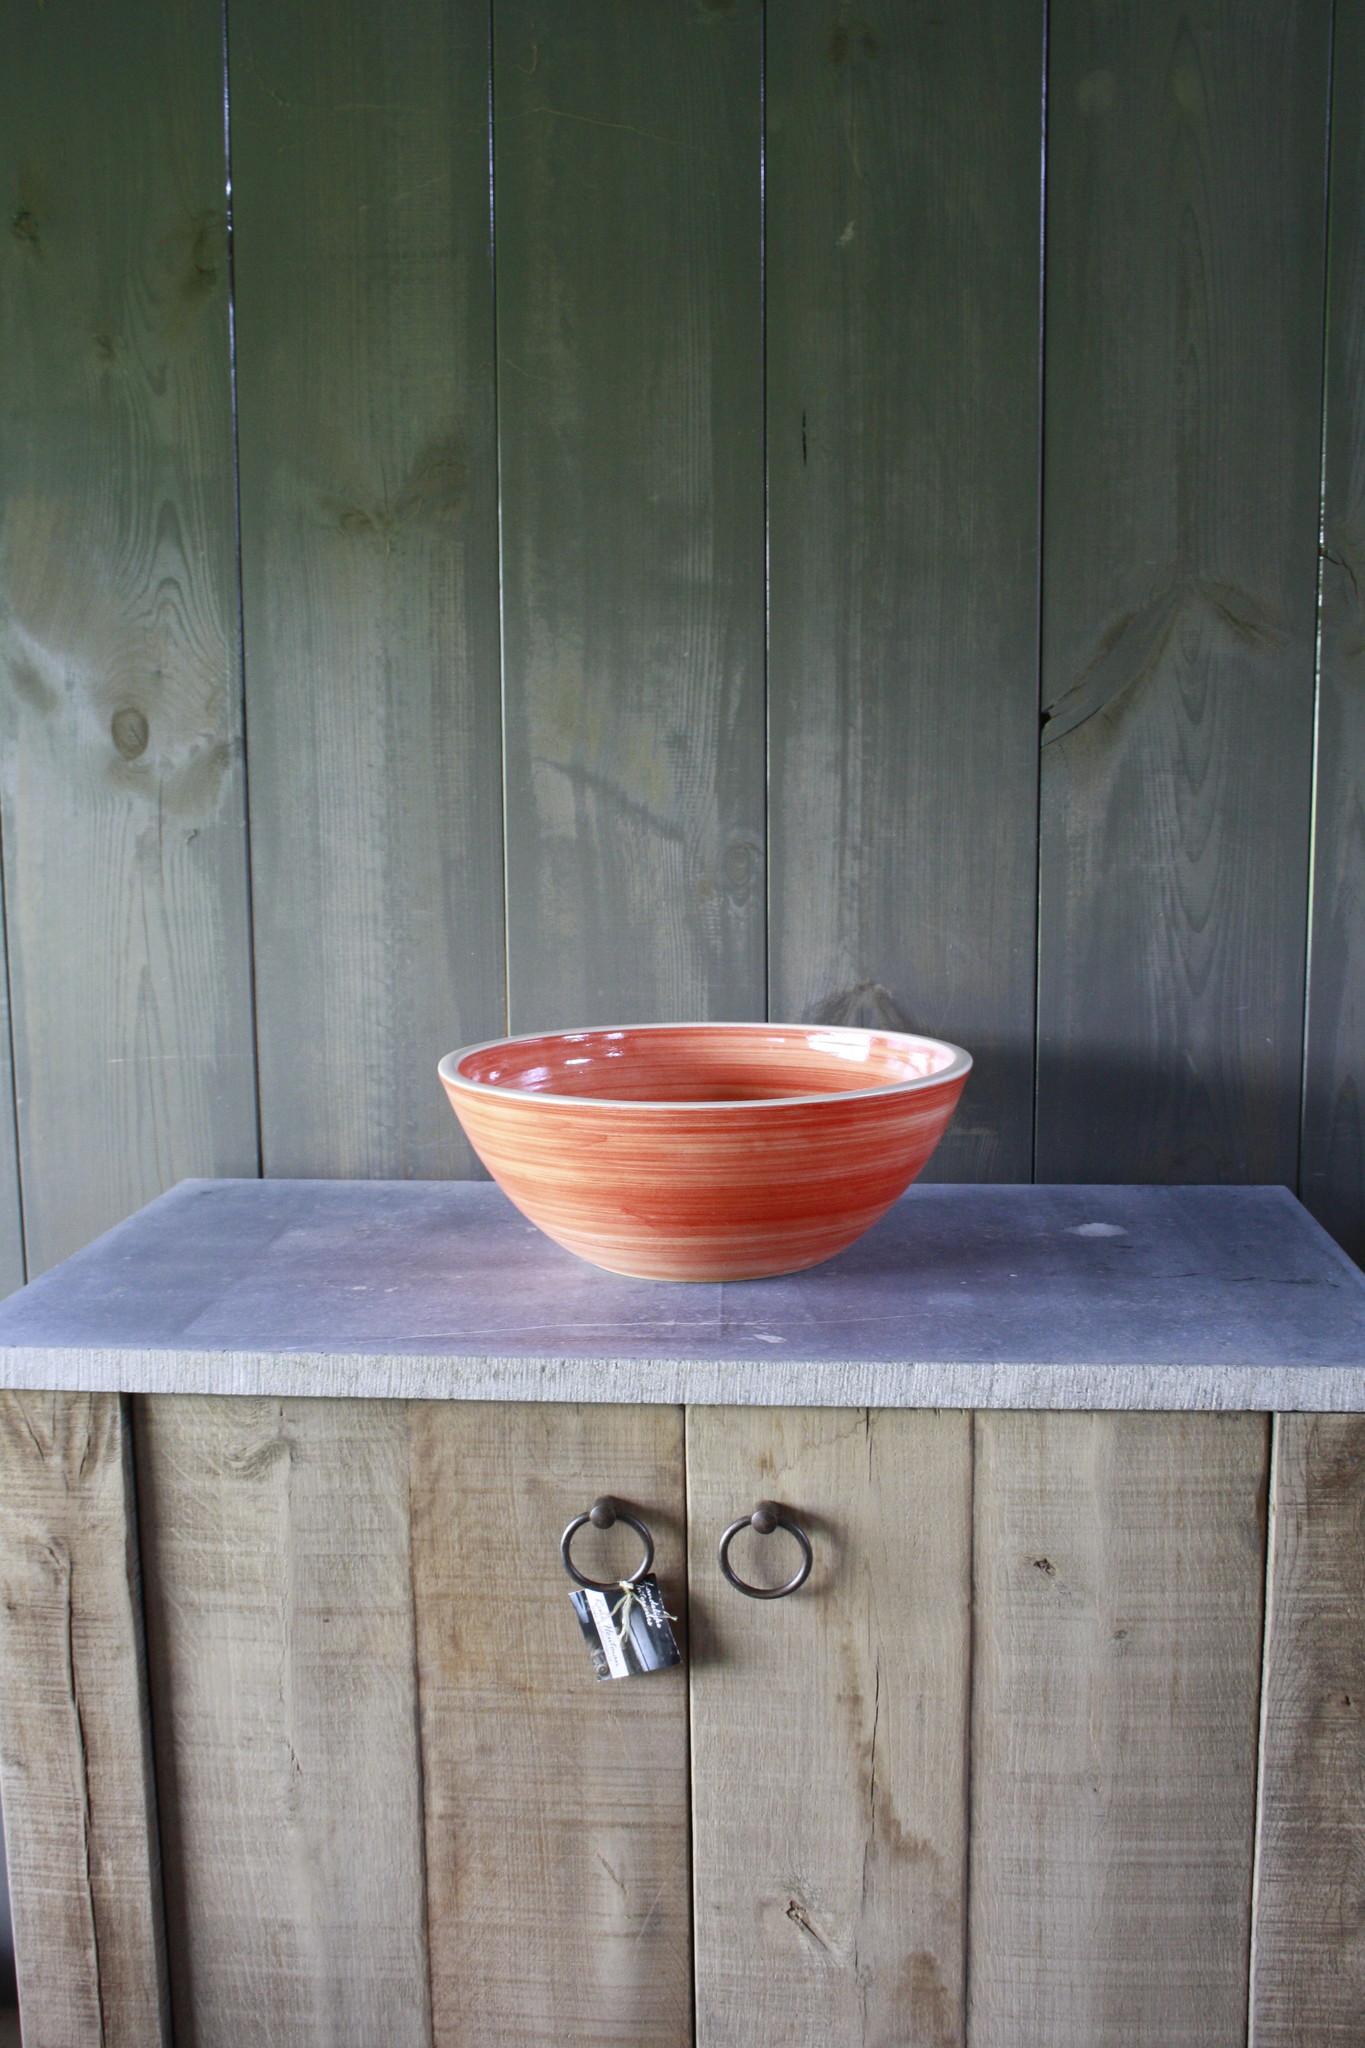 Borchia waskom porselein oranje 40 cm x 15 cm-1